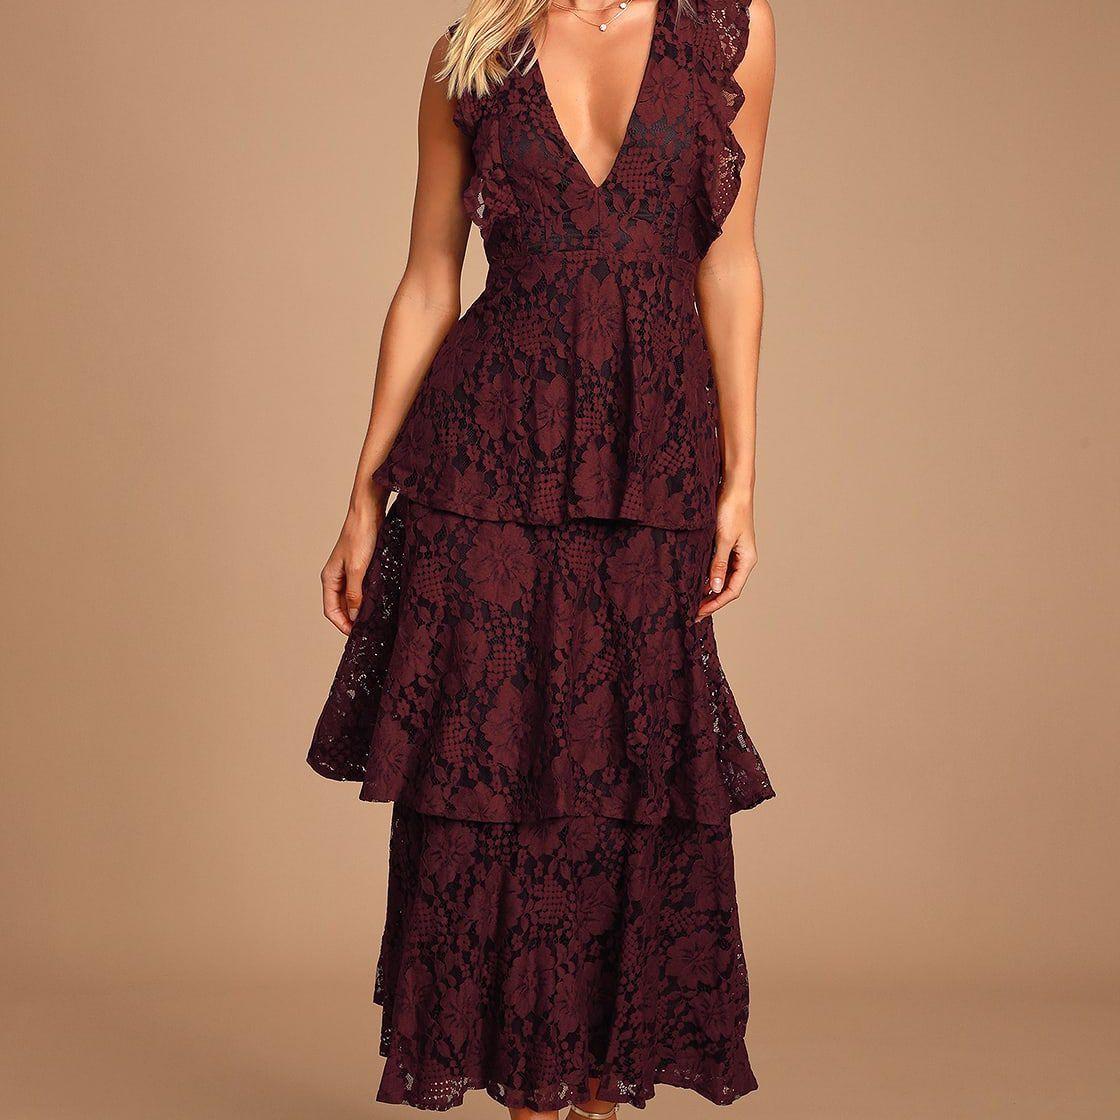 Lulus Molinetto Burgundy Lace Ruffled Tiered Sleeveless Maxi Dress